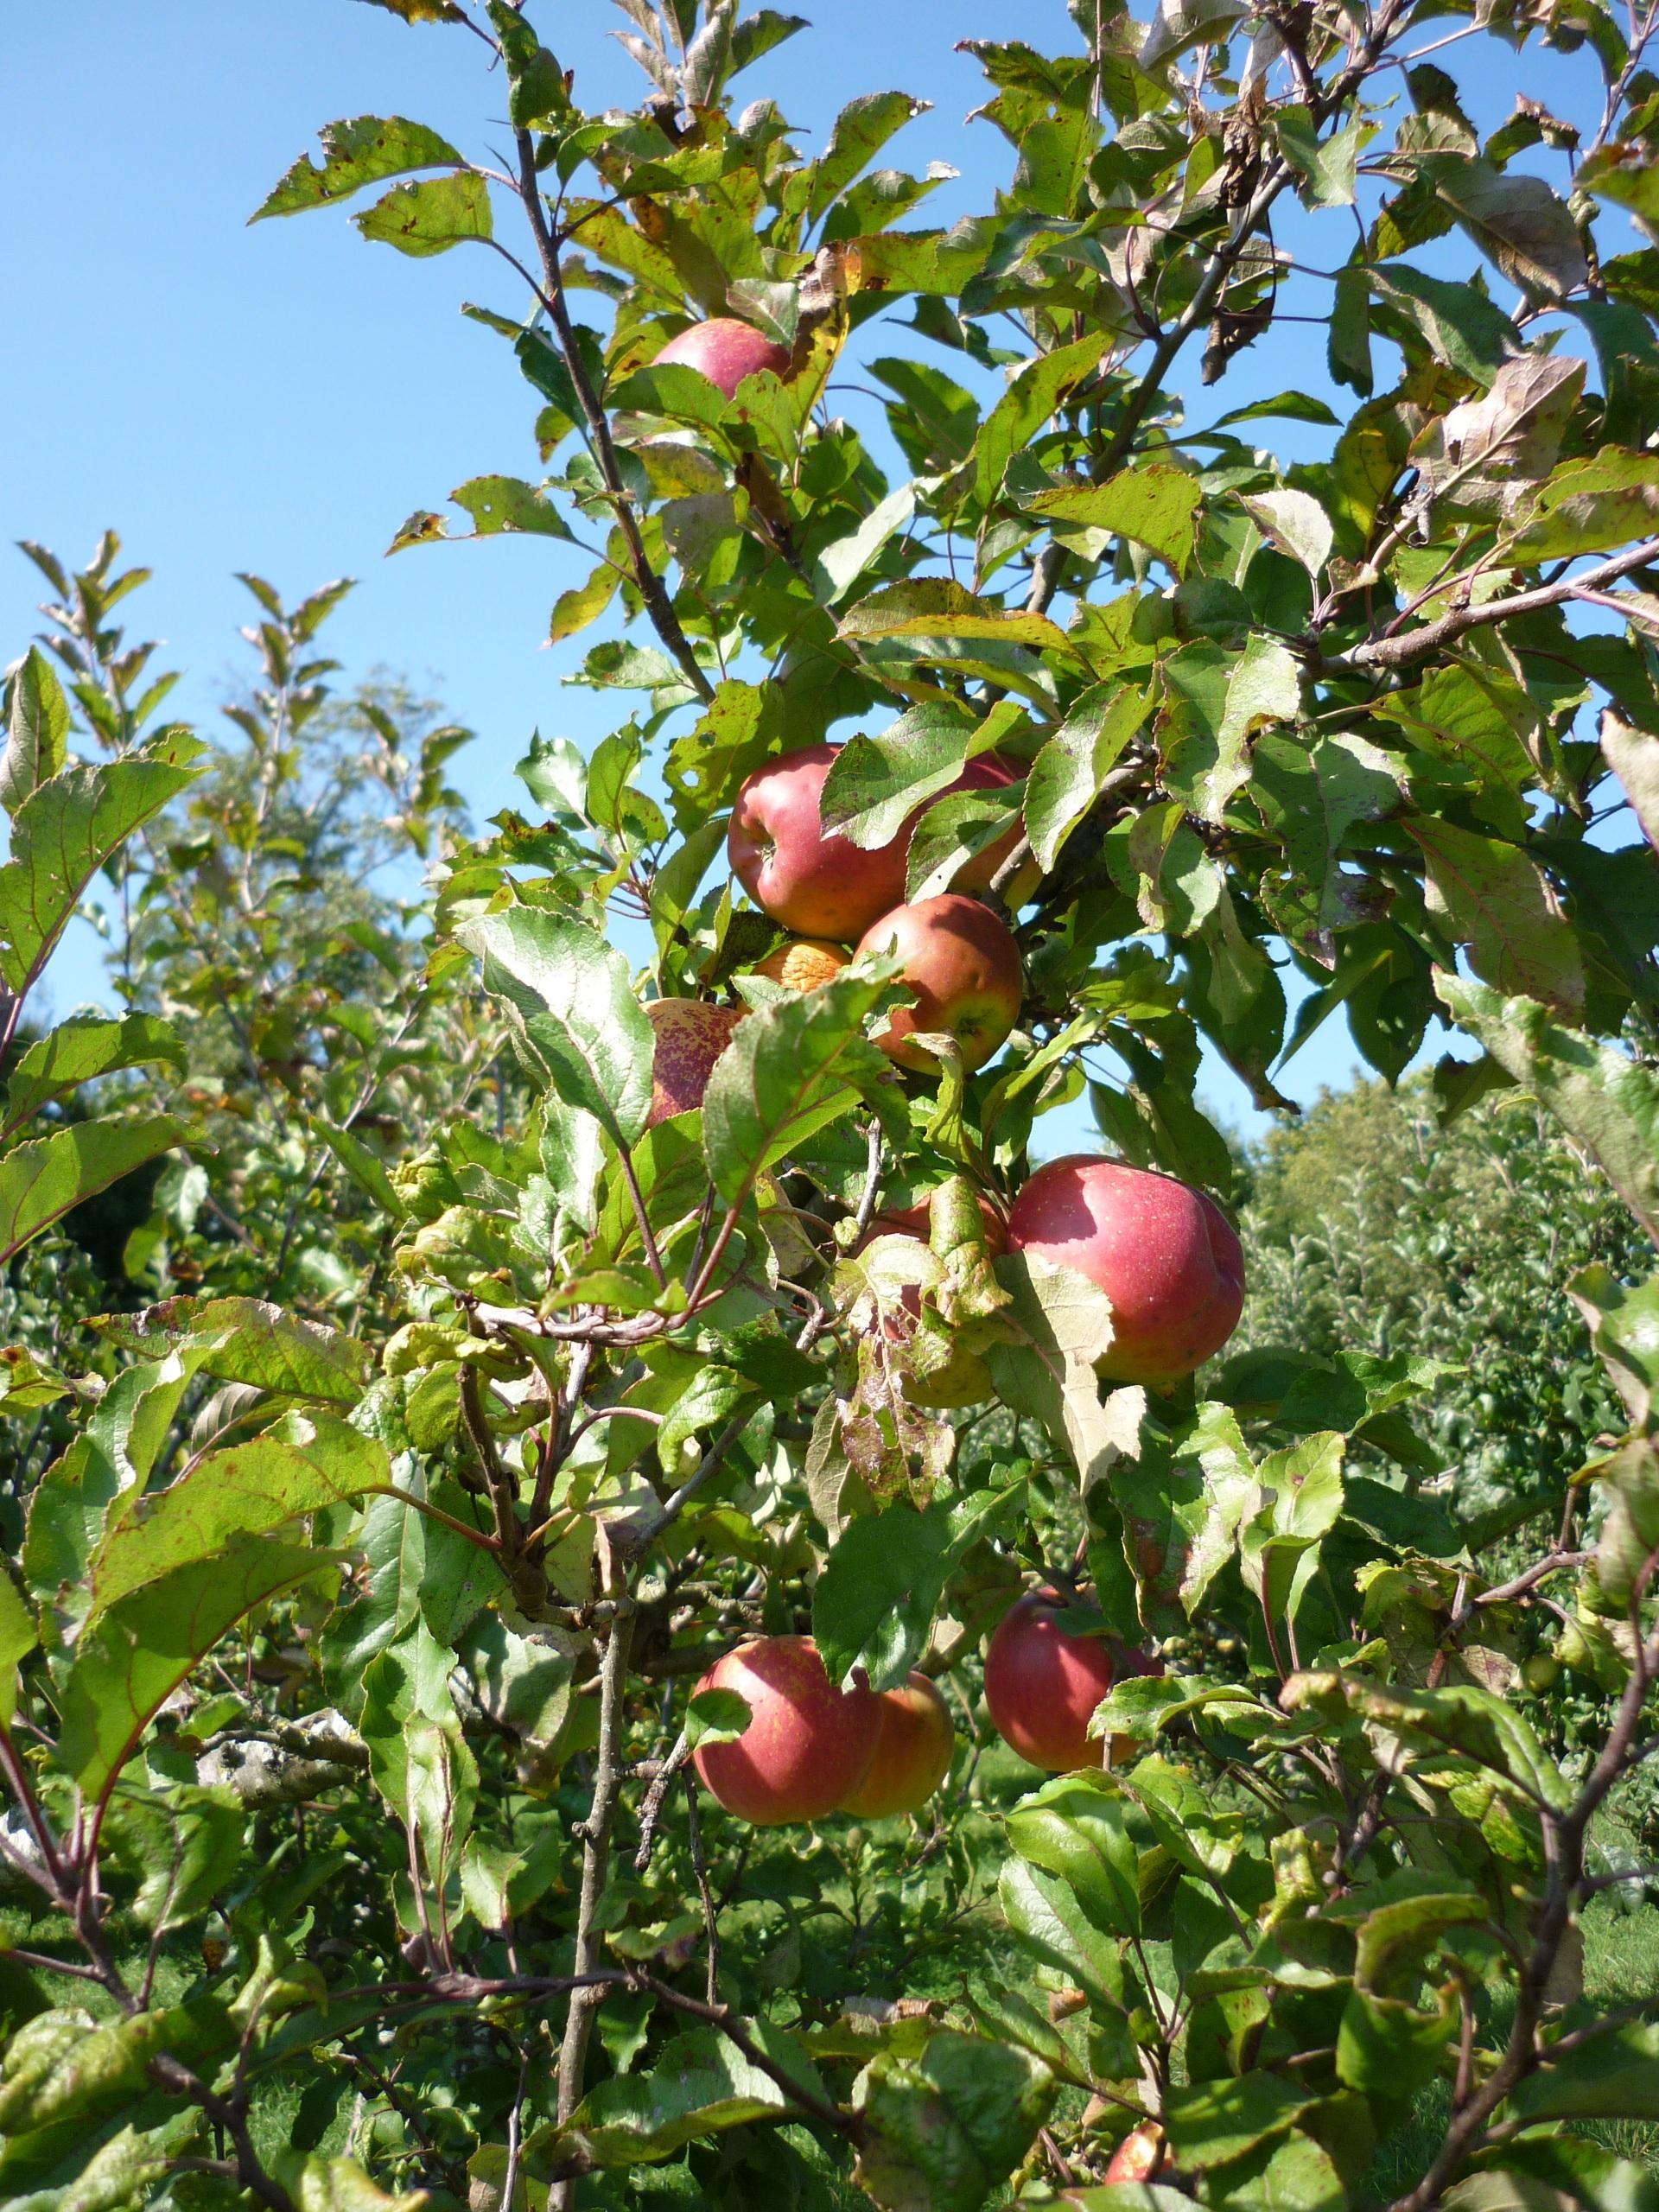 Fotos gratis manzana rbol rama fruta flor huerta for Lista de arboles frutales de hoja perenne